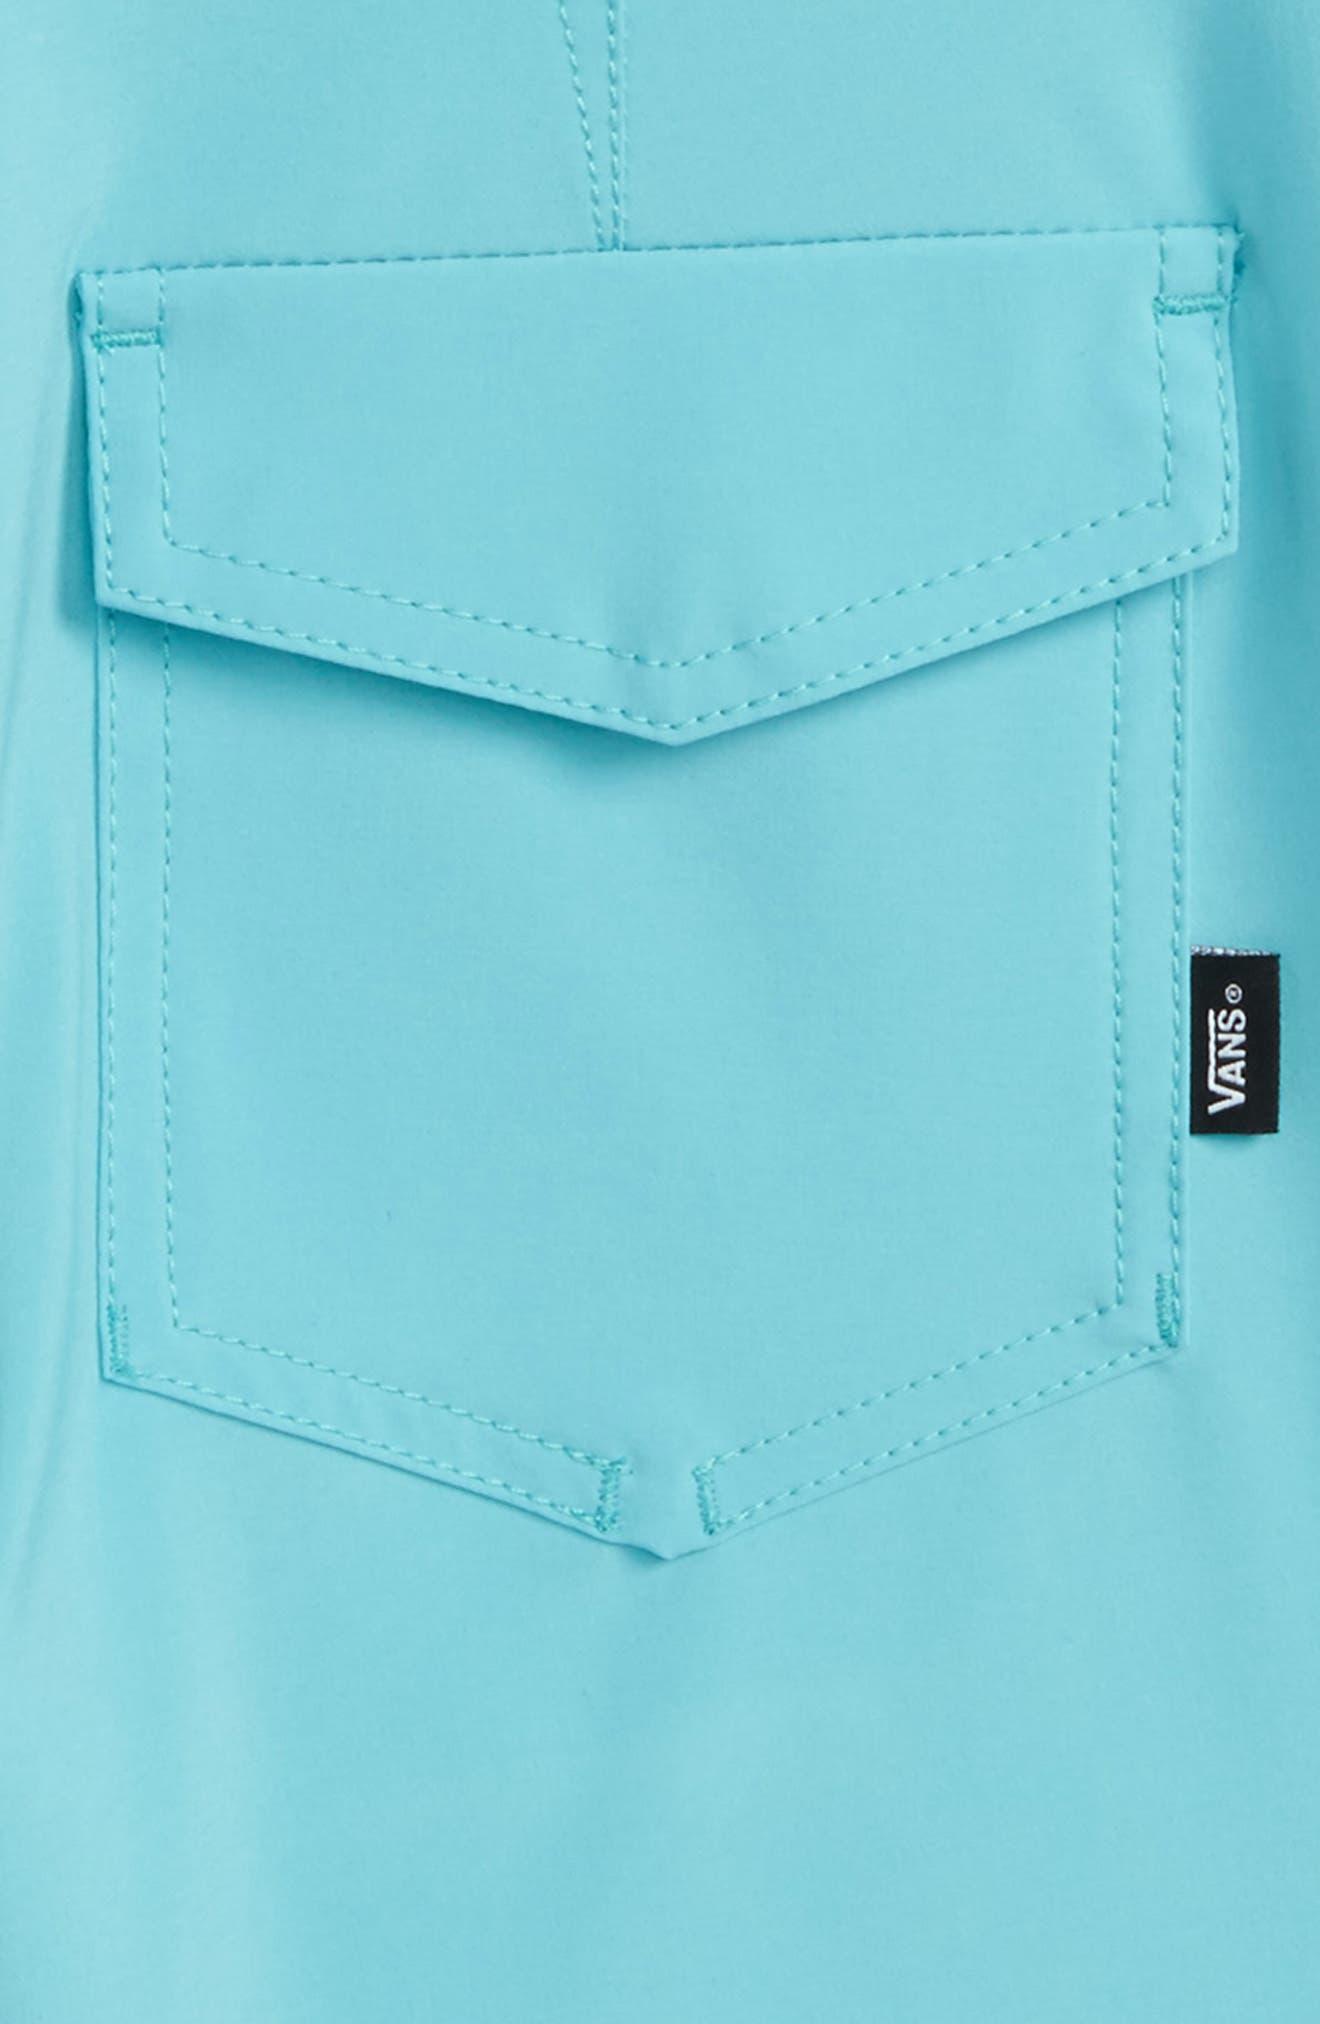 Sidestripe Board Shorts,                             Alternate thumbnail 3, color,